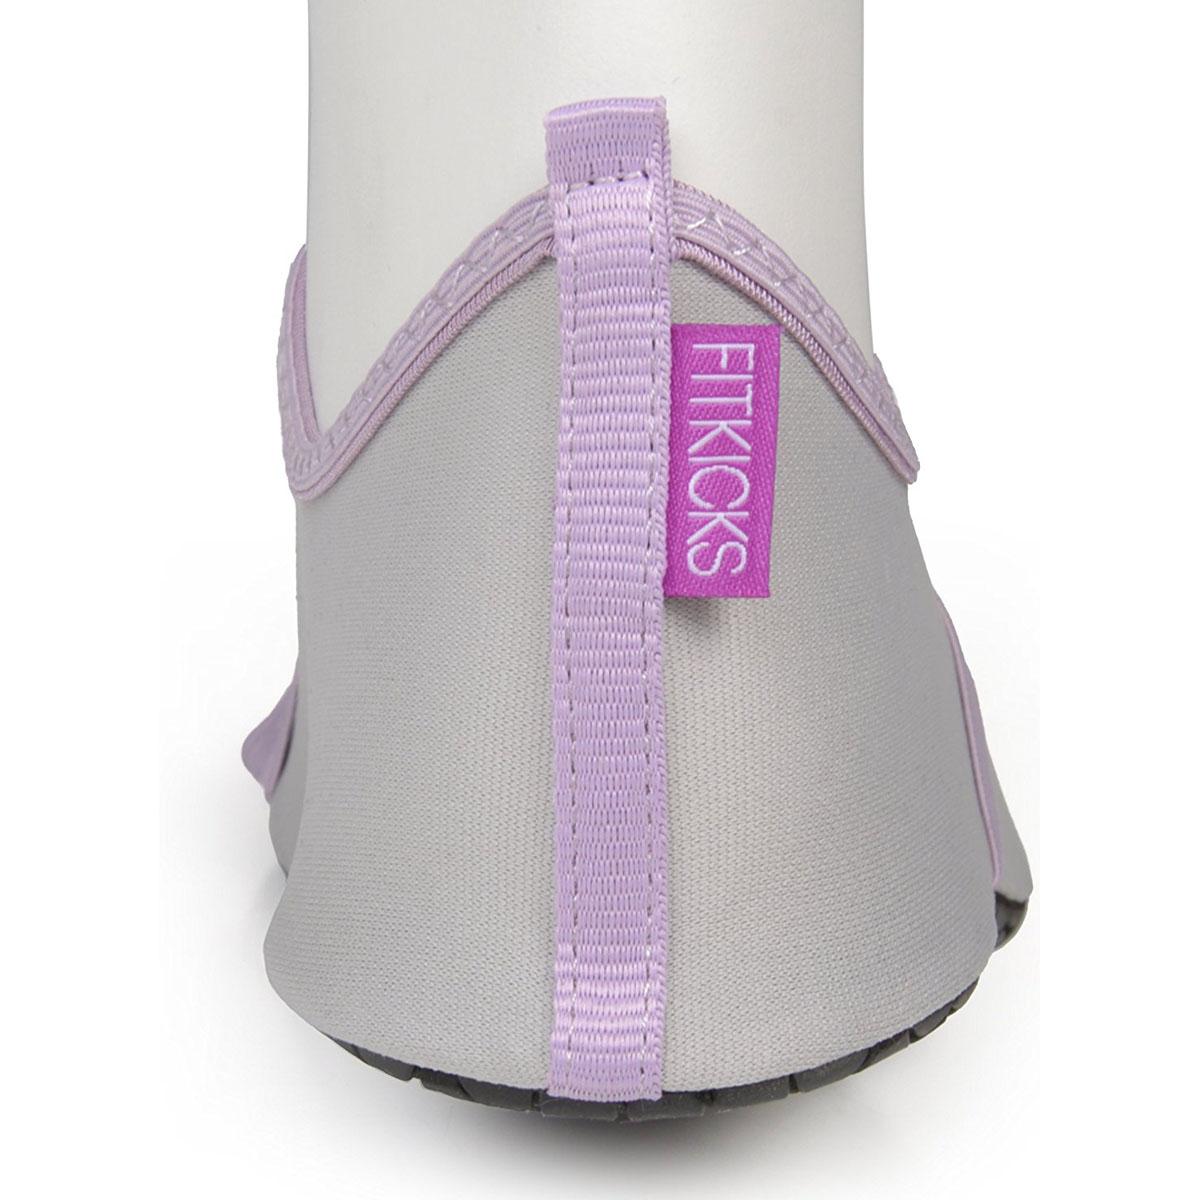 FitKicks-Women-039-s-Non-Slip-Sole-Active-Footwear thumbnail 27